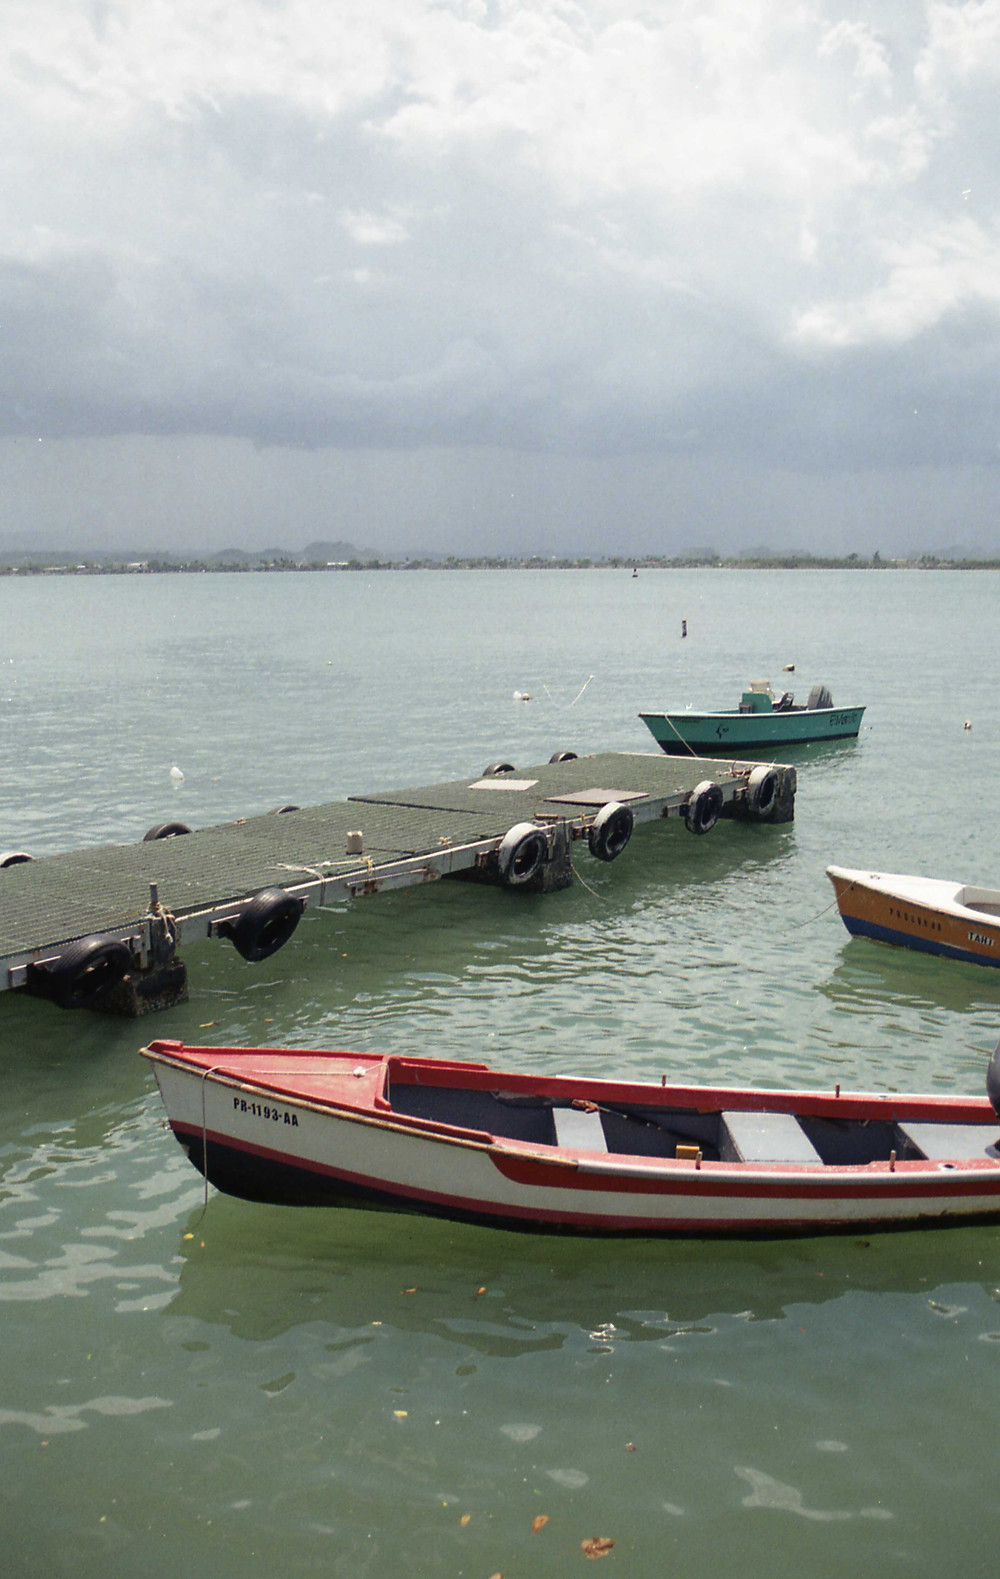 Fishing boats in Old San Juan, Puerto Rico